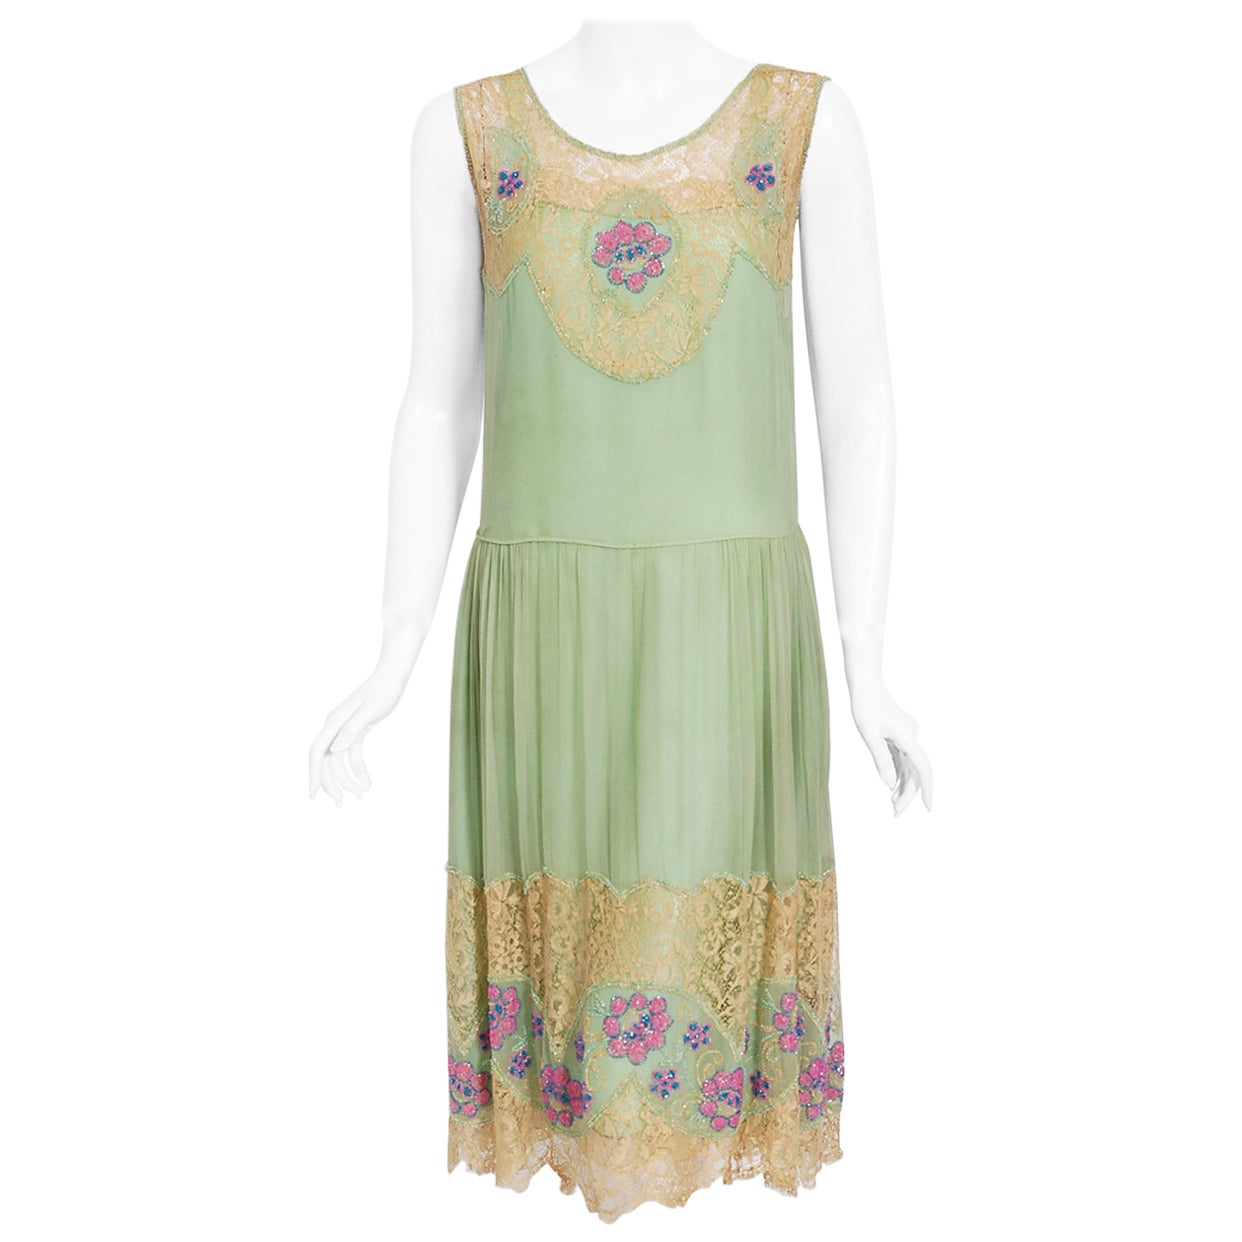 Vintage 1920's Mint-Green Chiffon & Floral Motif Beaded Lace Drop-Waist Dress